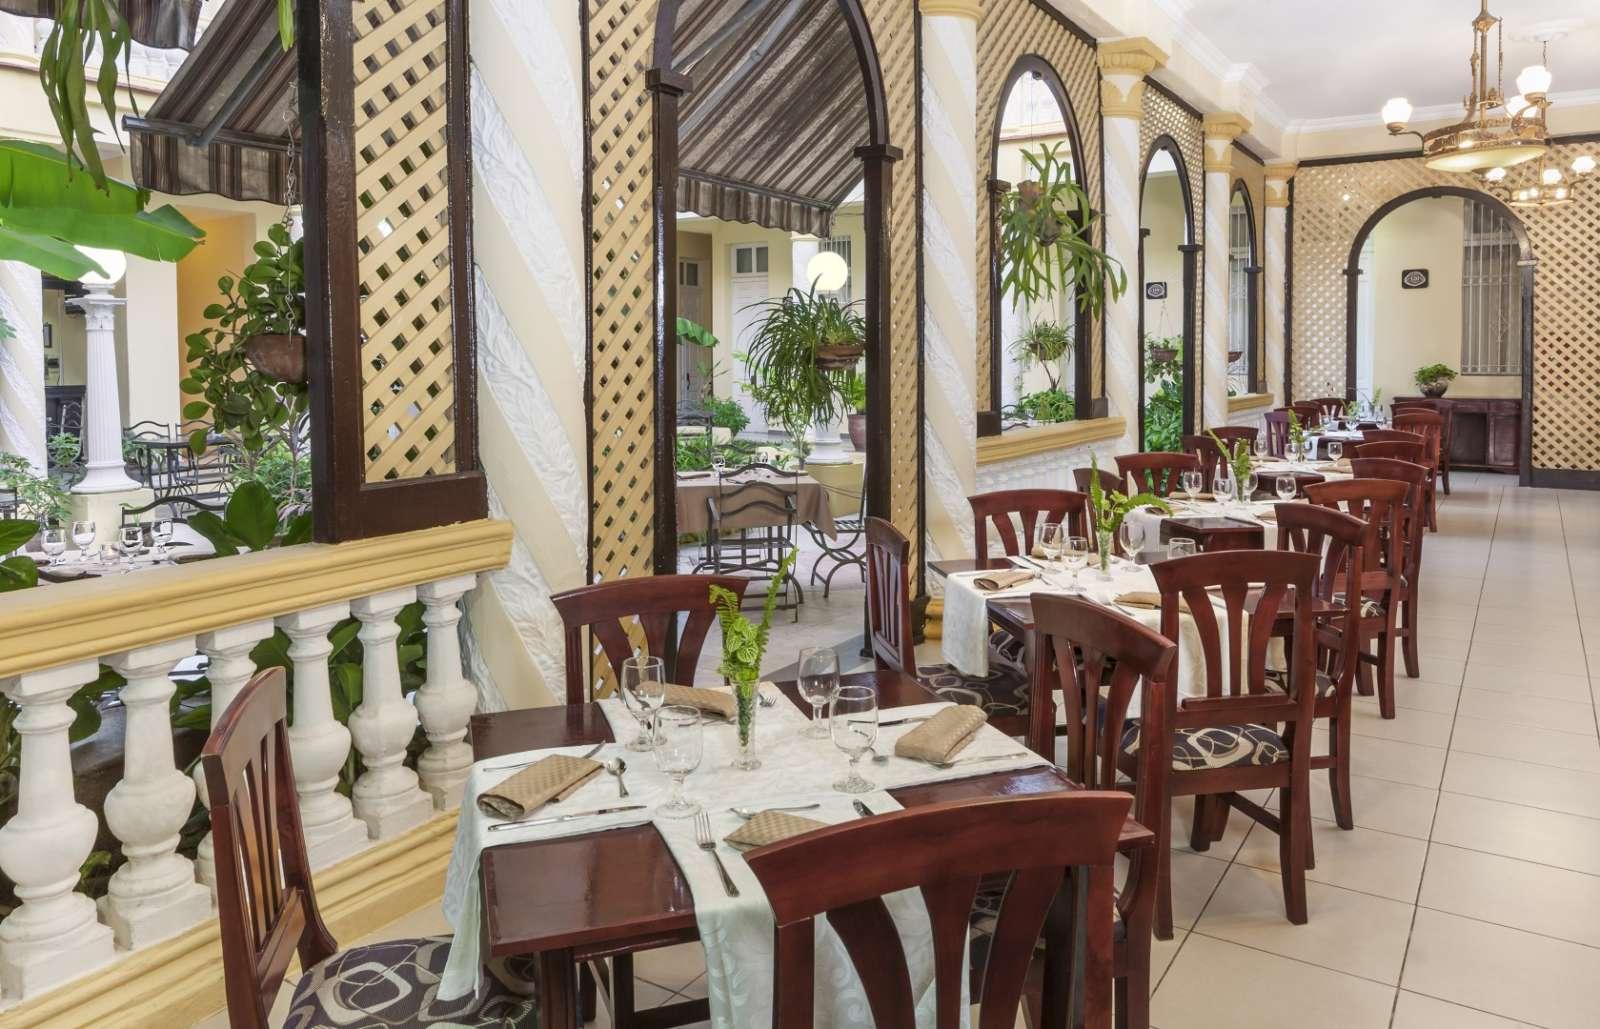 Restaurant at Melia Colon in Camaguey